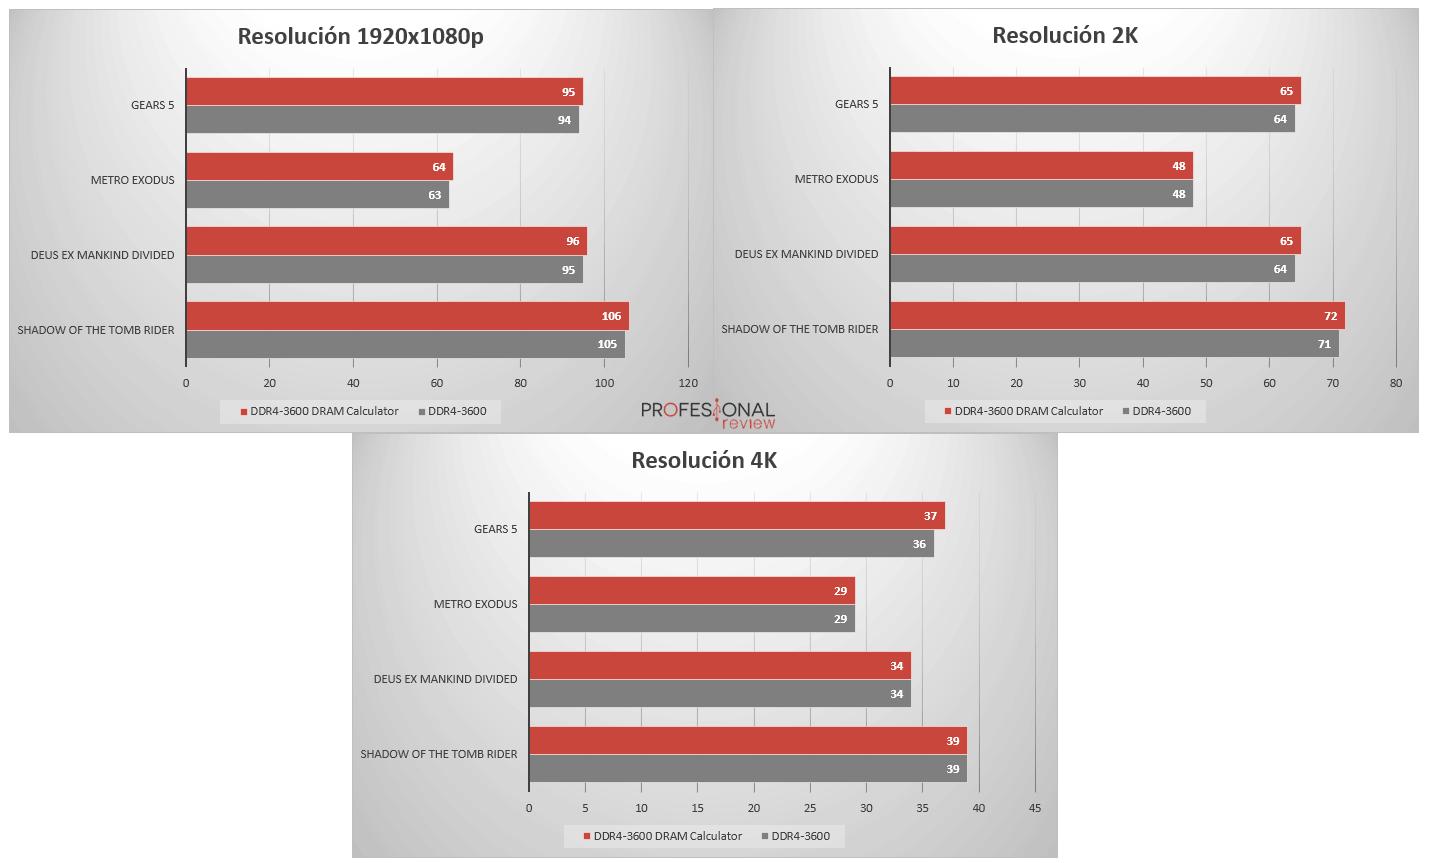 DRAM Calculator benchmarks